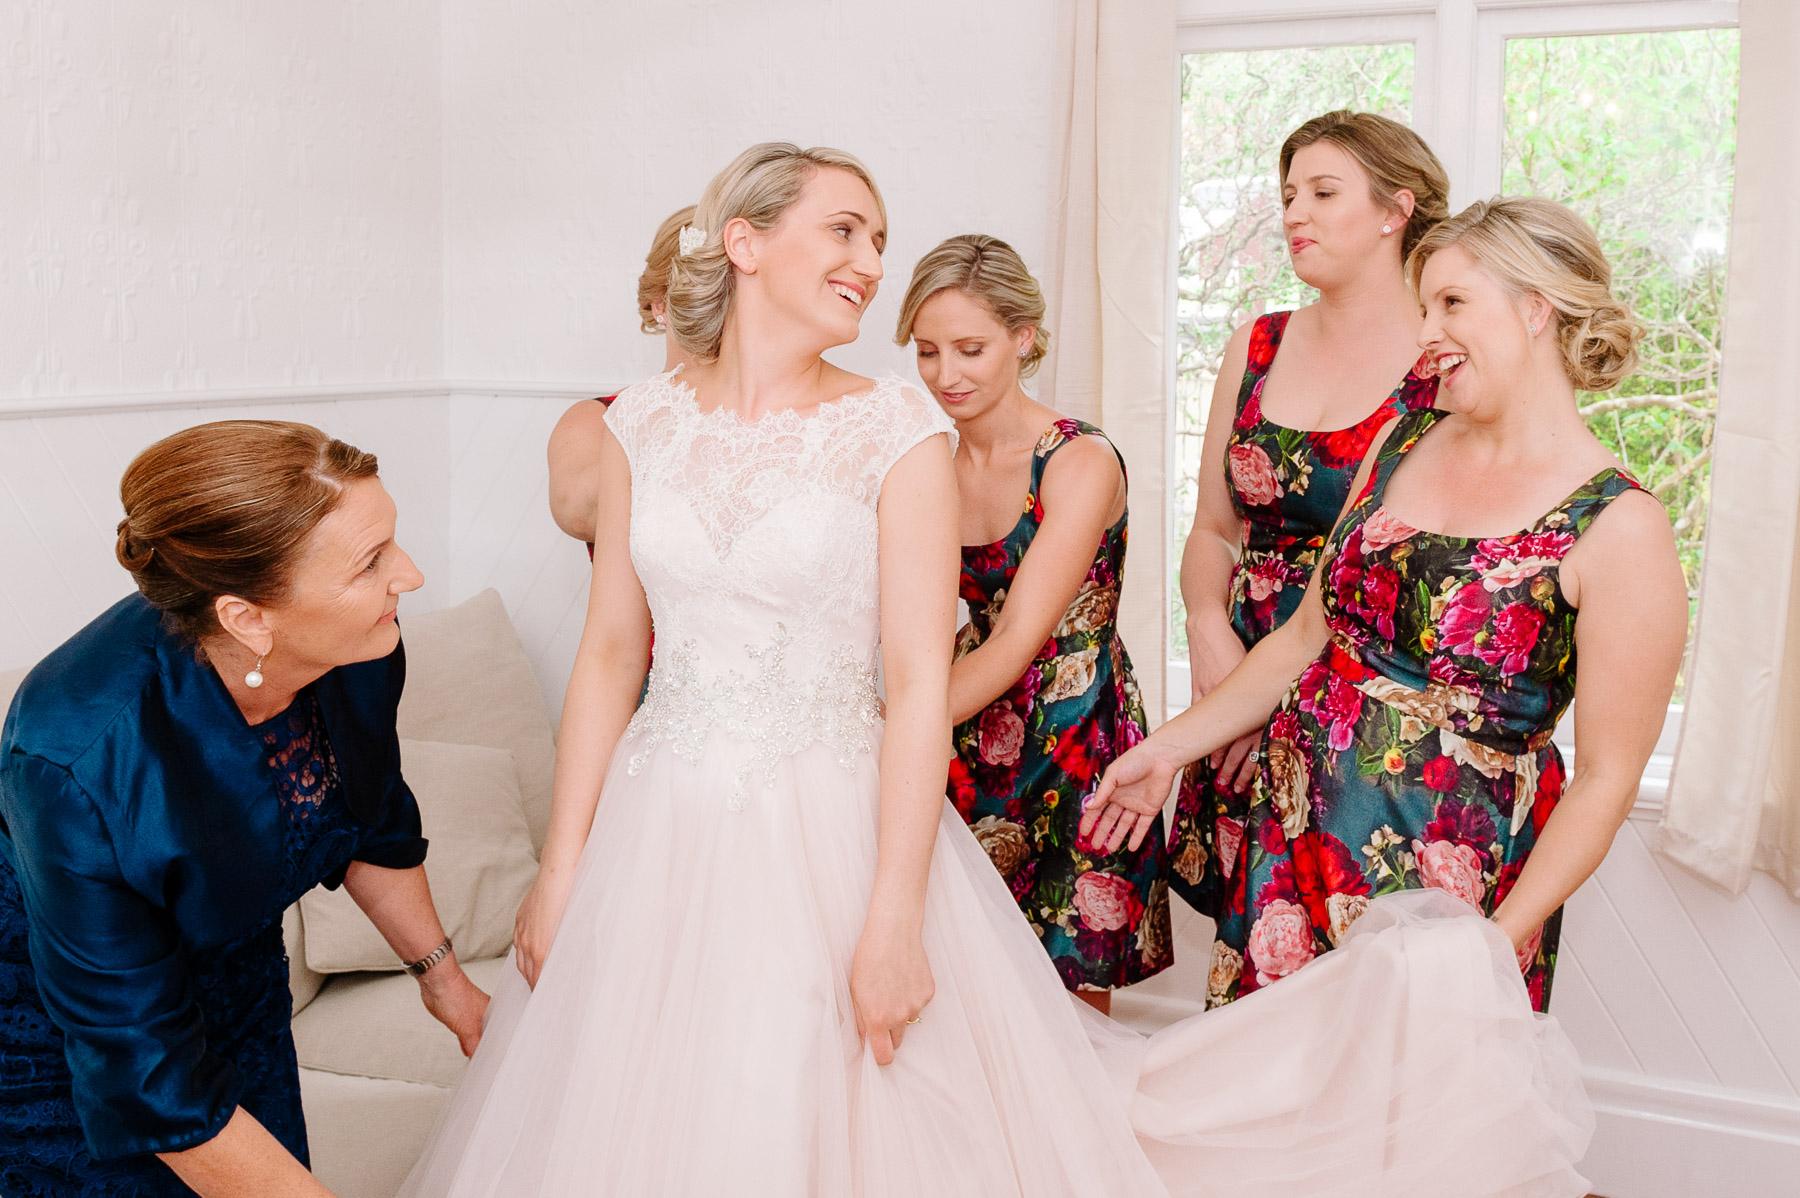 Marnie_and_Charlie_Yarra_Valley_Wedding_Blog-16.jpg